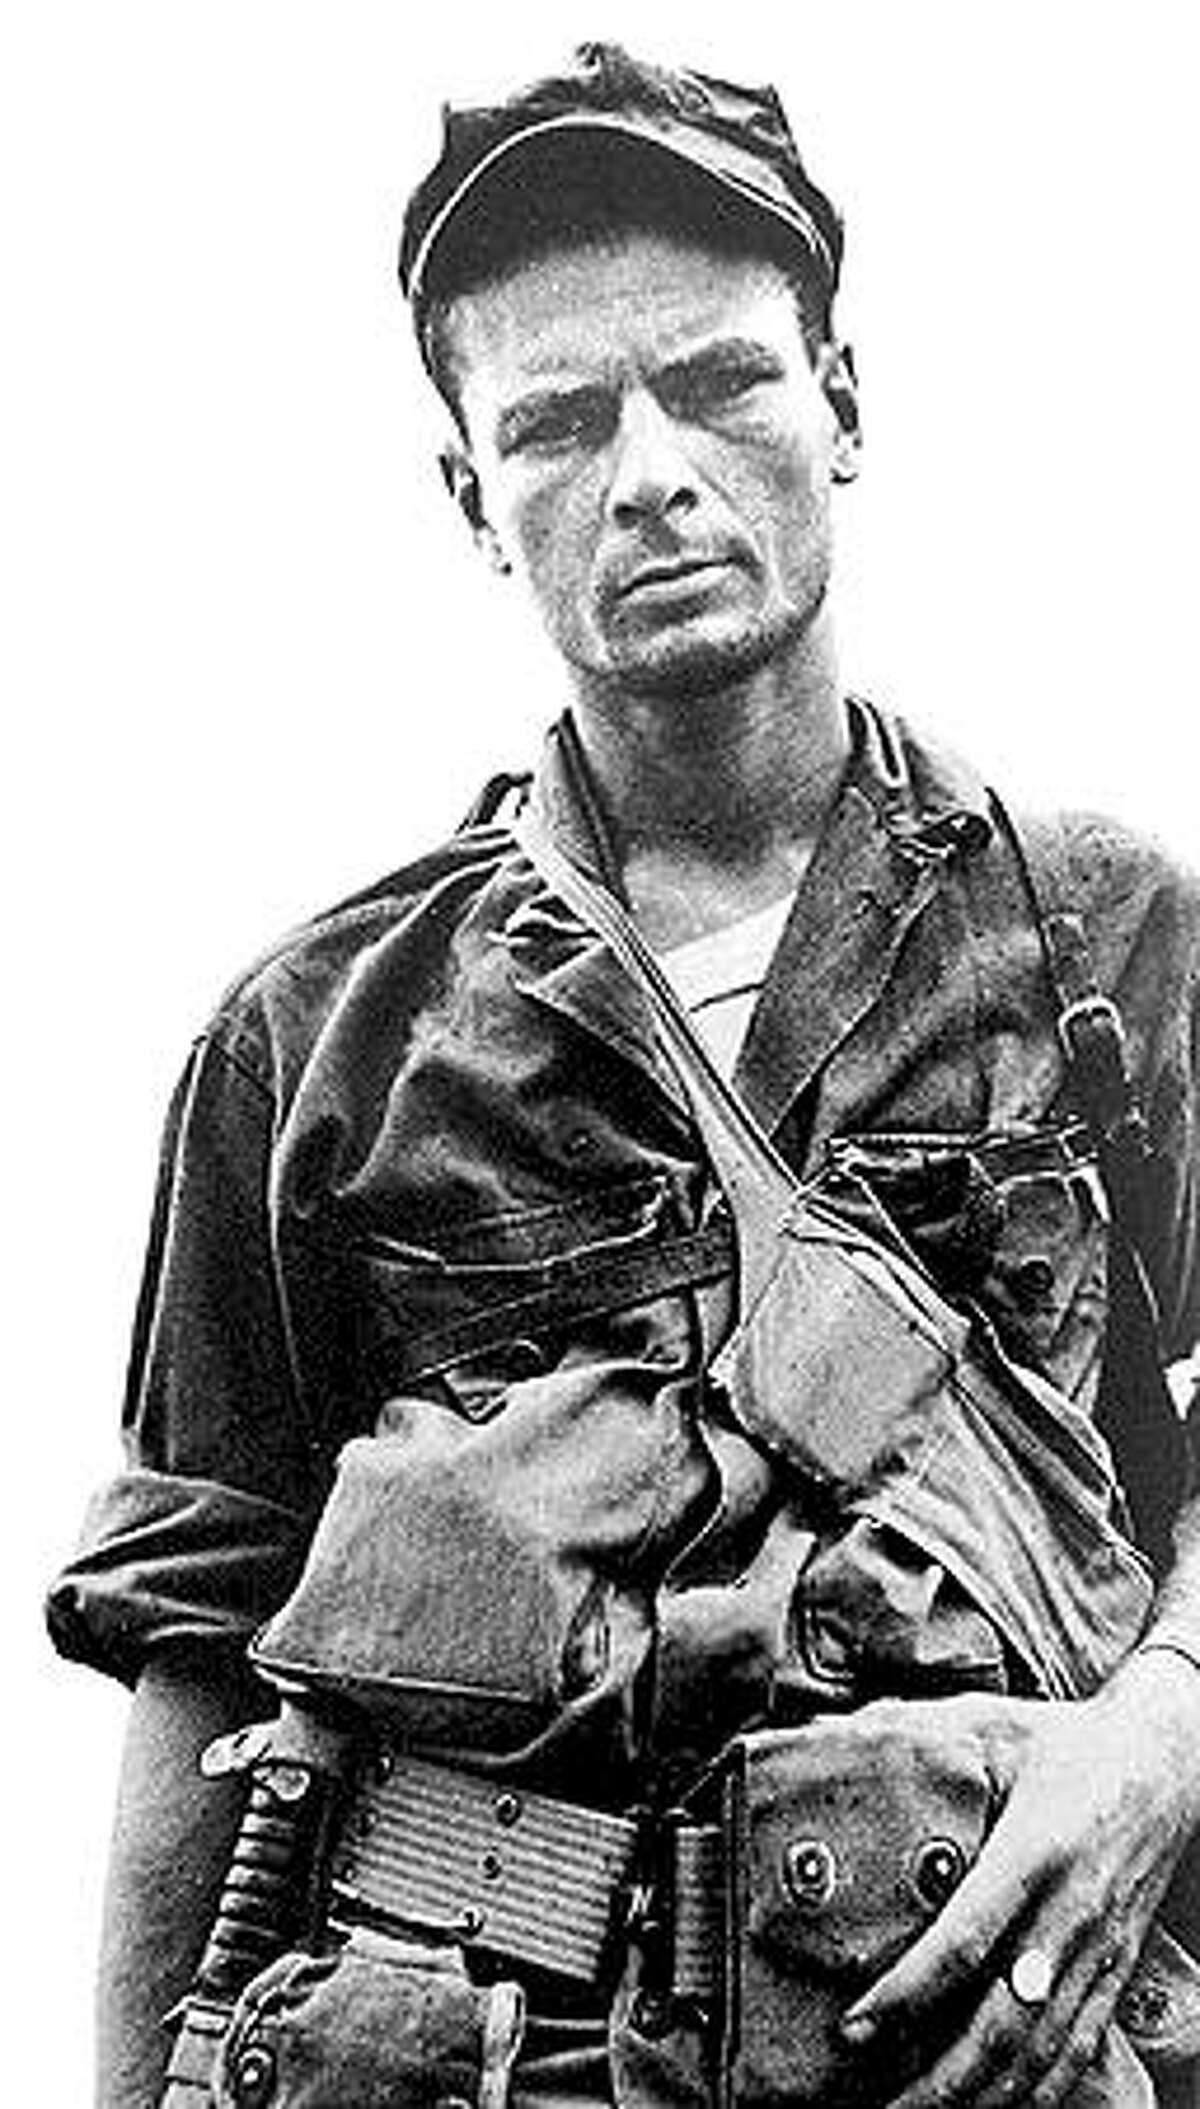 U.S. Army Ranger Robert Prince in 1945